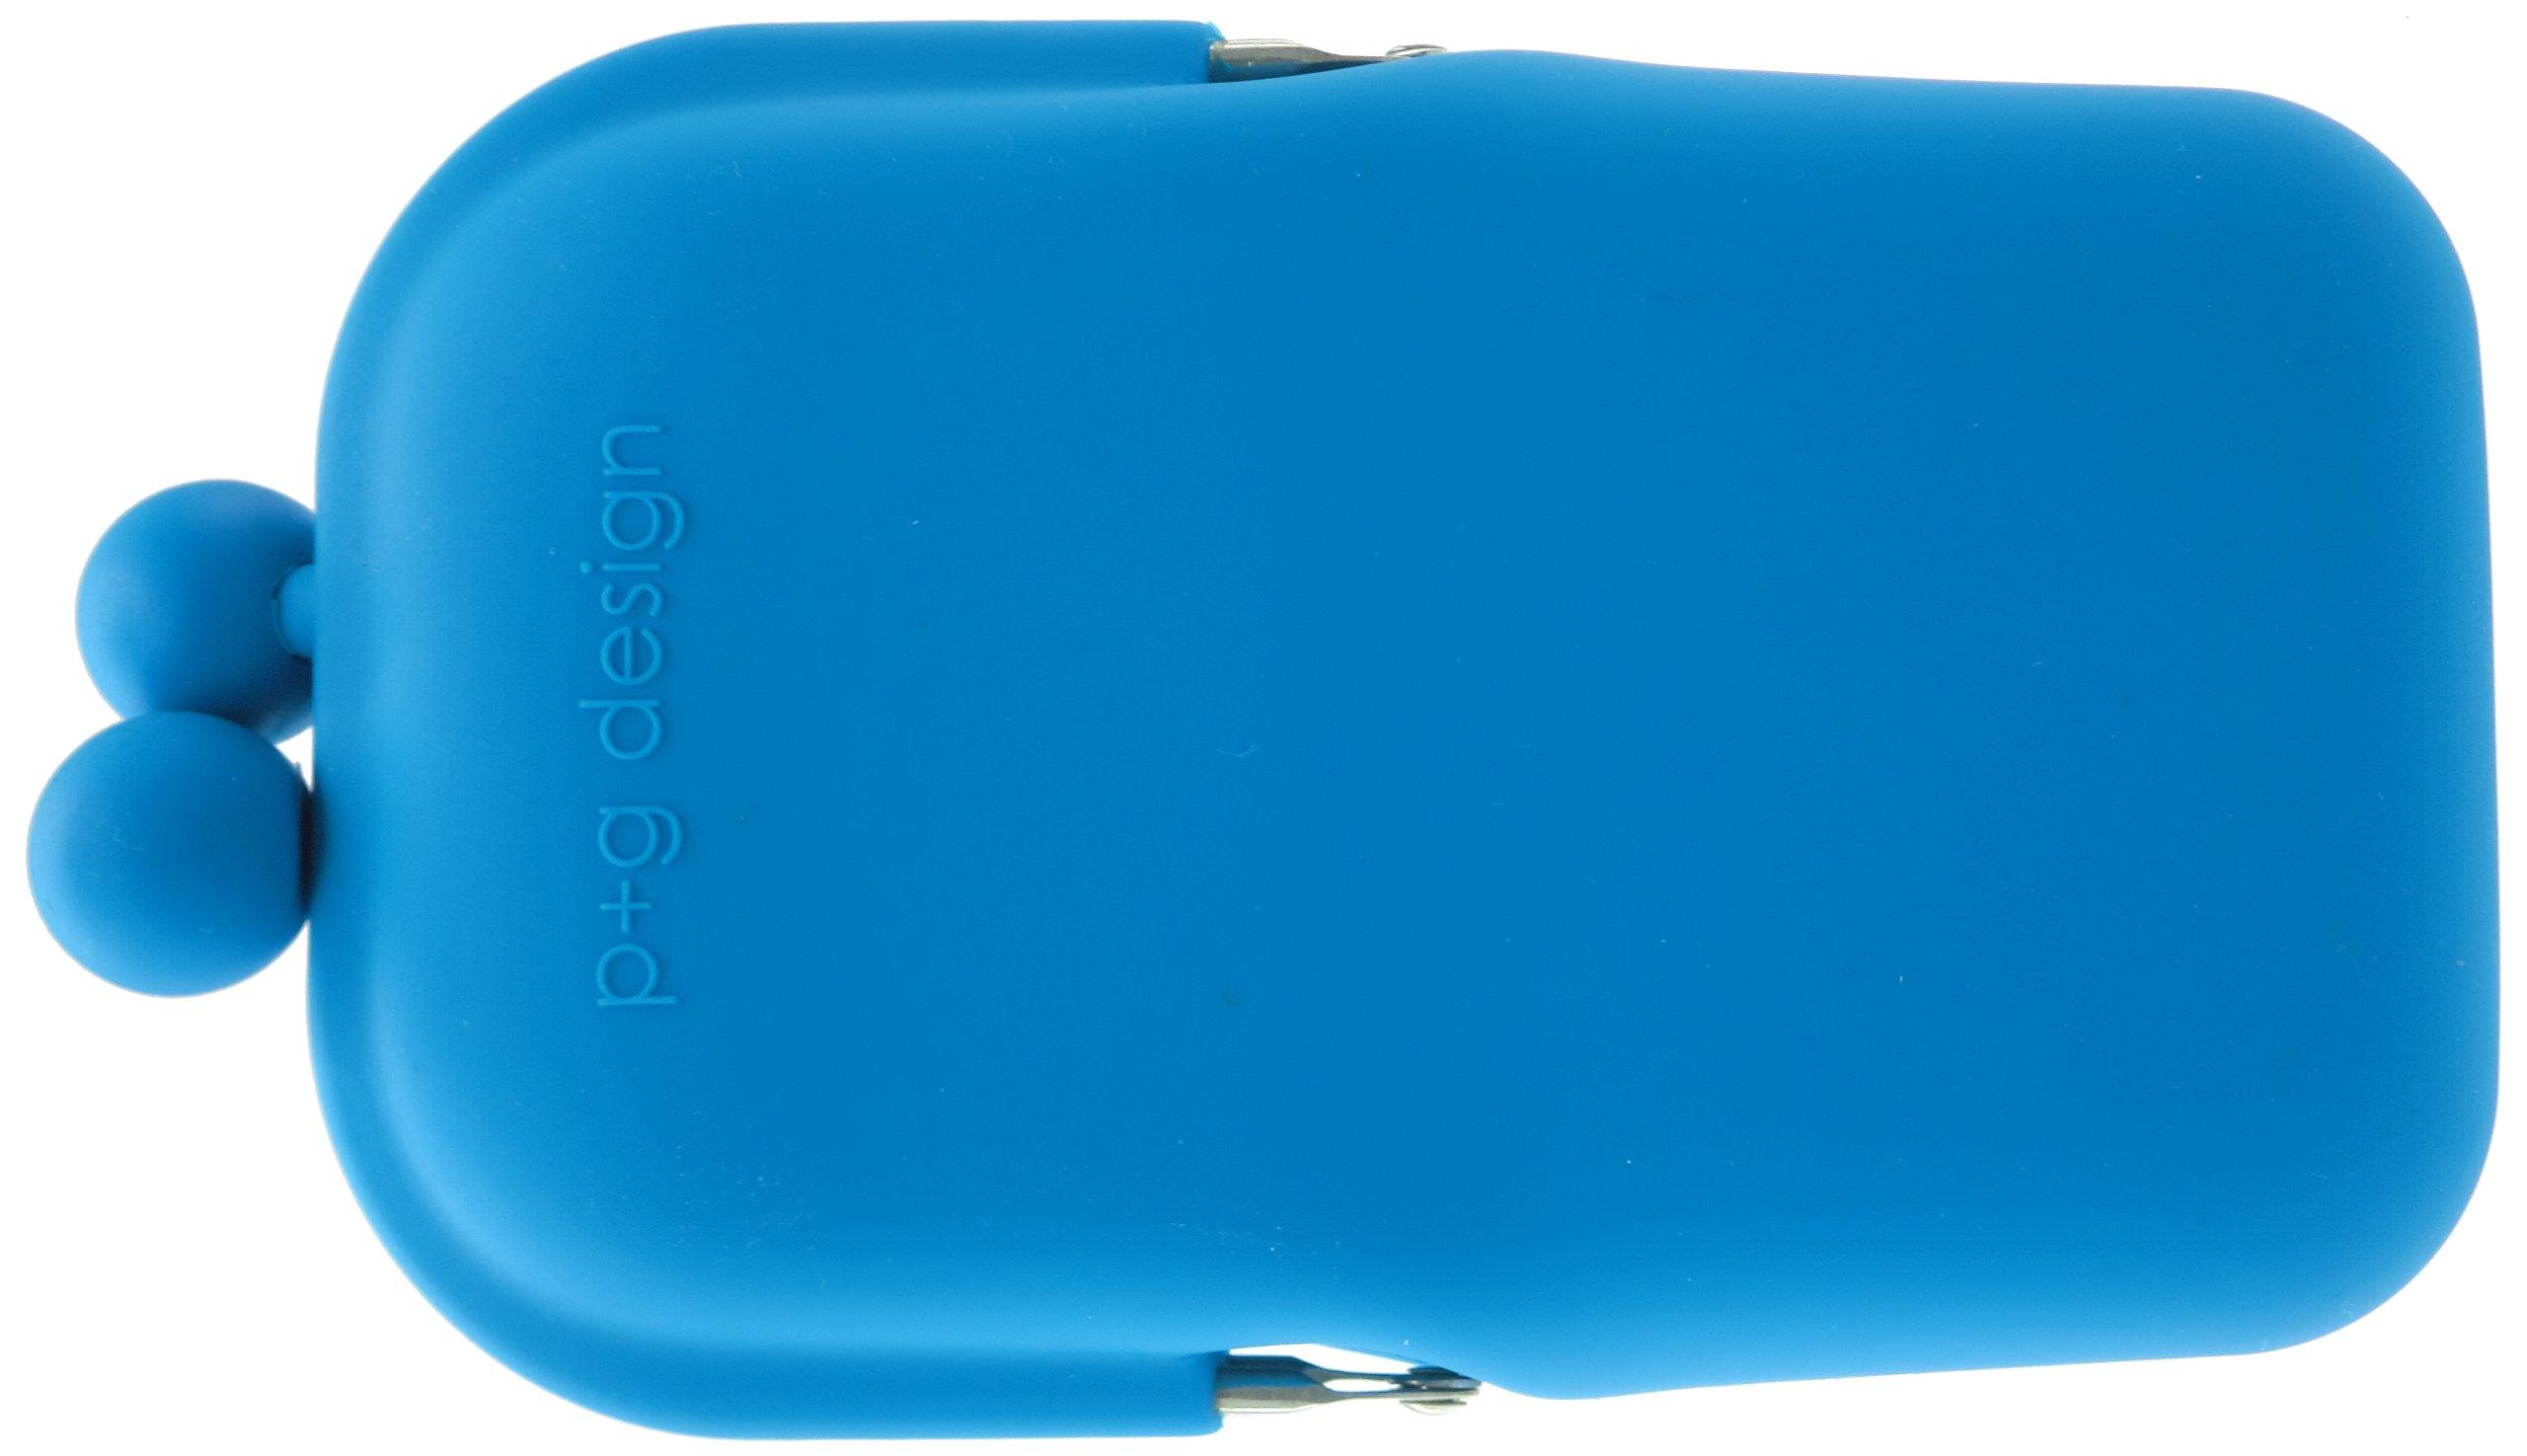 HAKKU Hair Iron GMC Toysfield p + g Design (Pochi 2) Blue PG - 13807, Medium, Clear